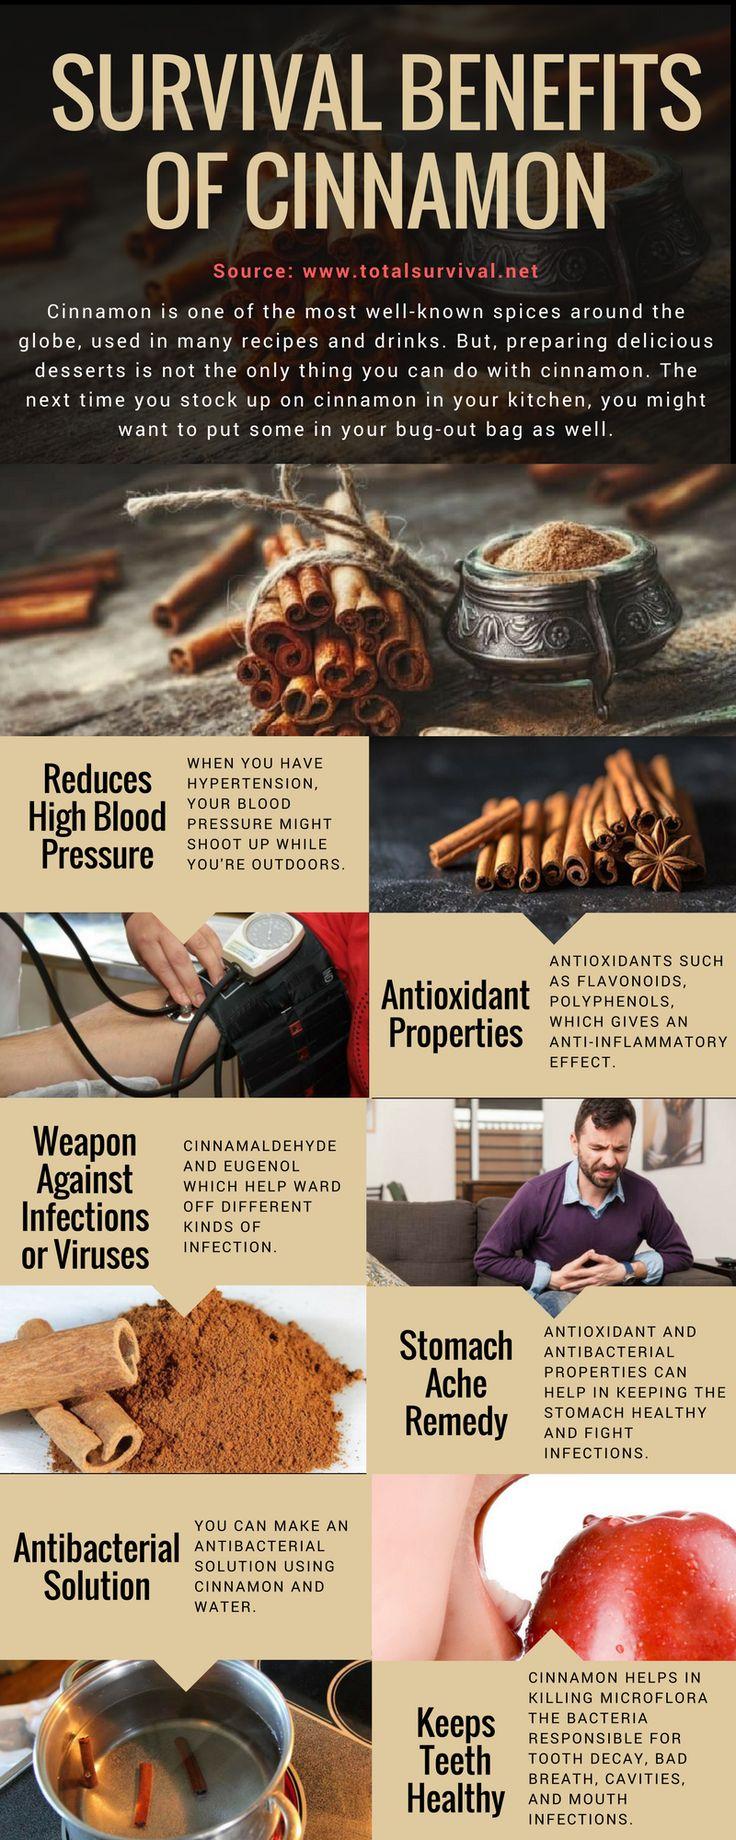 Survival Tips, Healthy Lifestyle Tips:7 Survival Benefits of Cinnamon. #natural #healthy #cinnamon #survival #offgrid #bushcraftmedicalkit